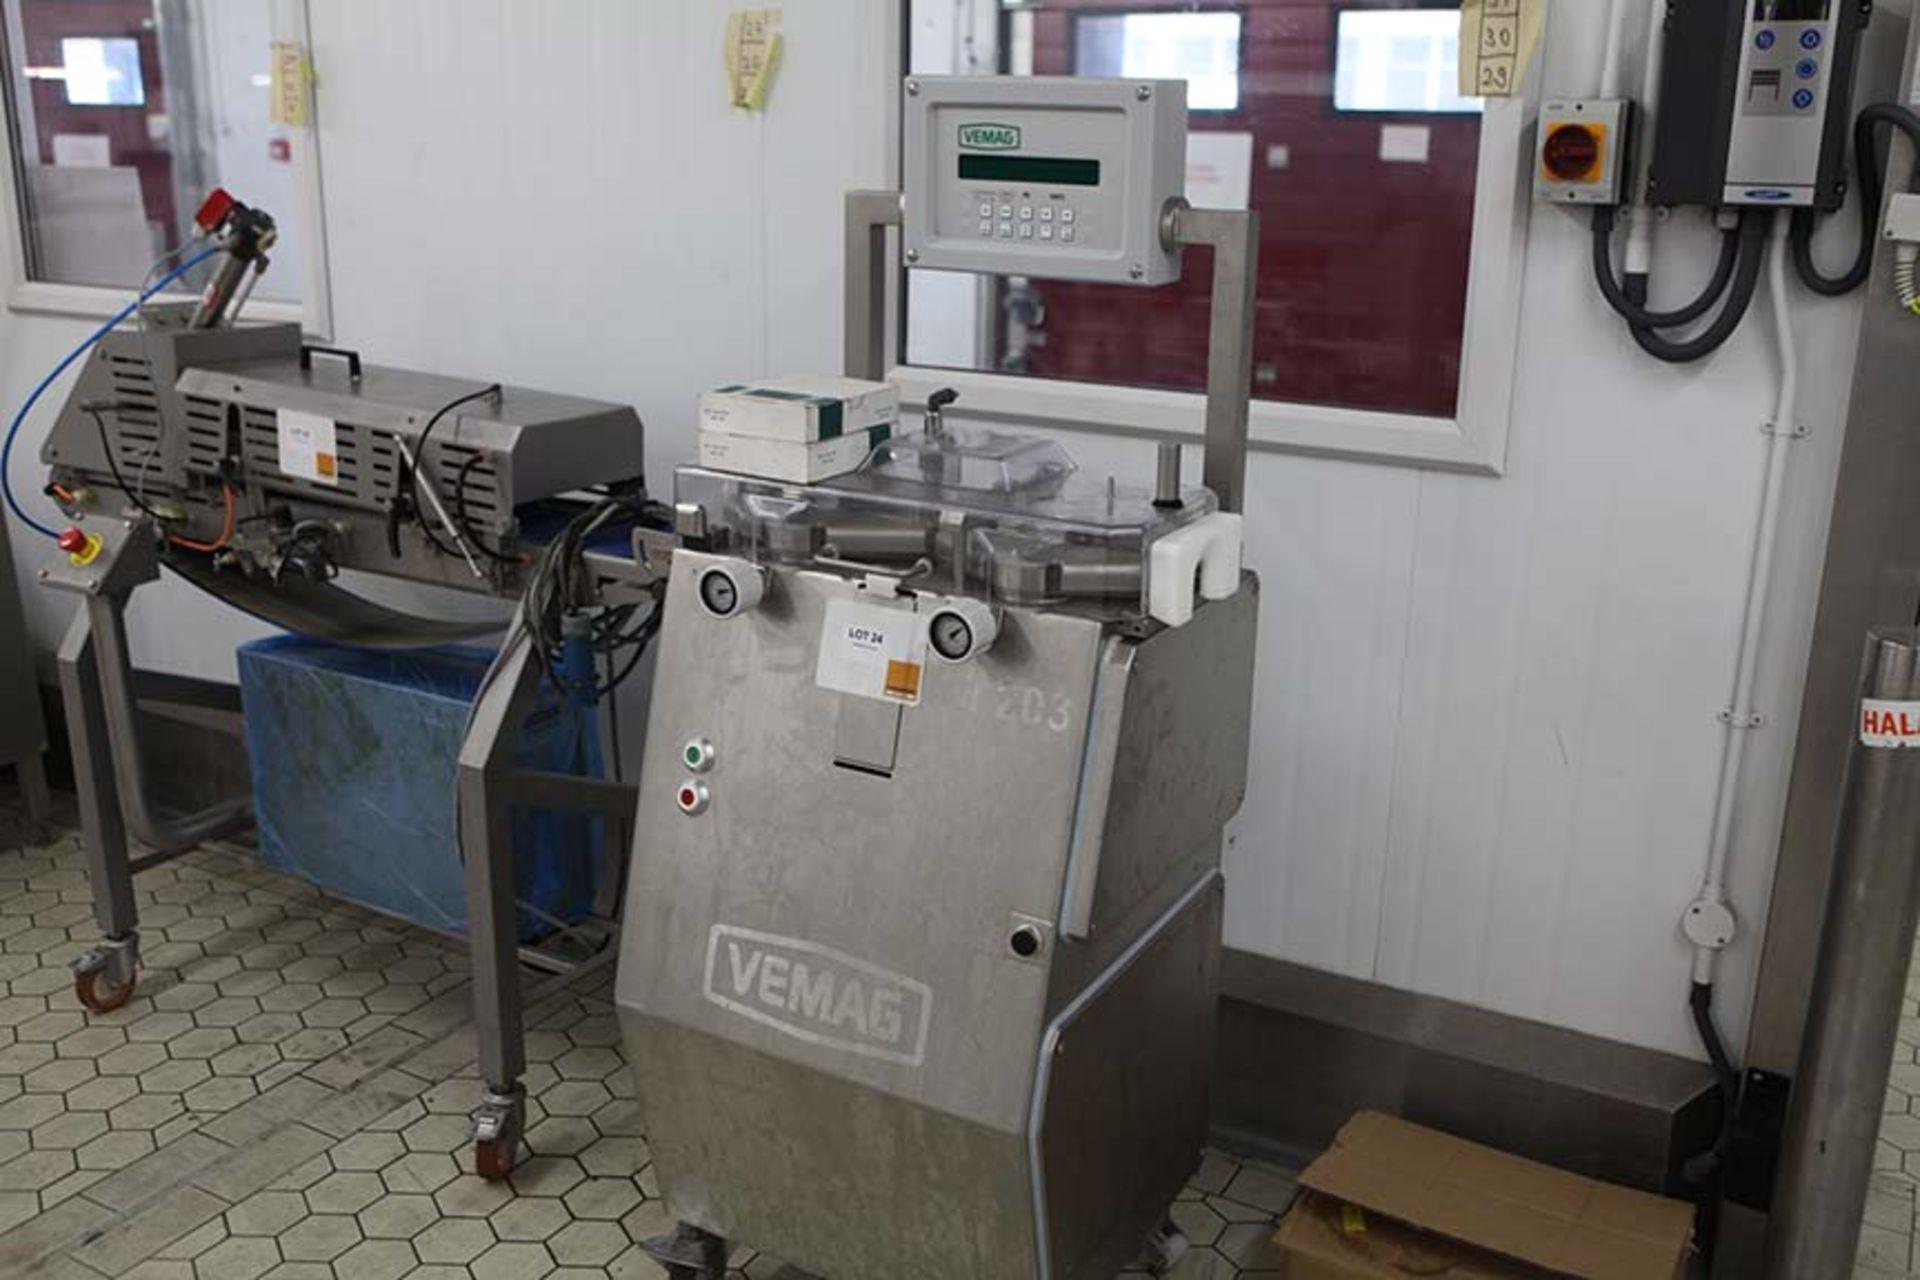 Lot 24 - VEGMAG TM203 Sausage Link Cutter Sn 2030555